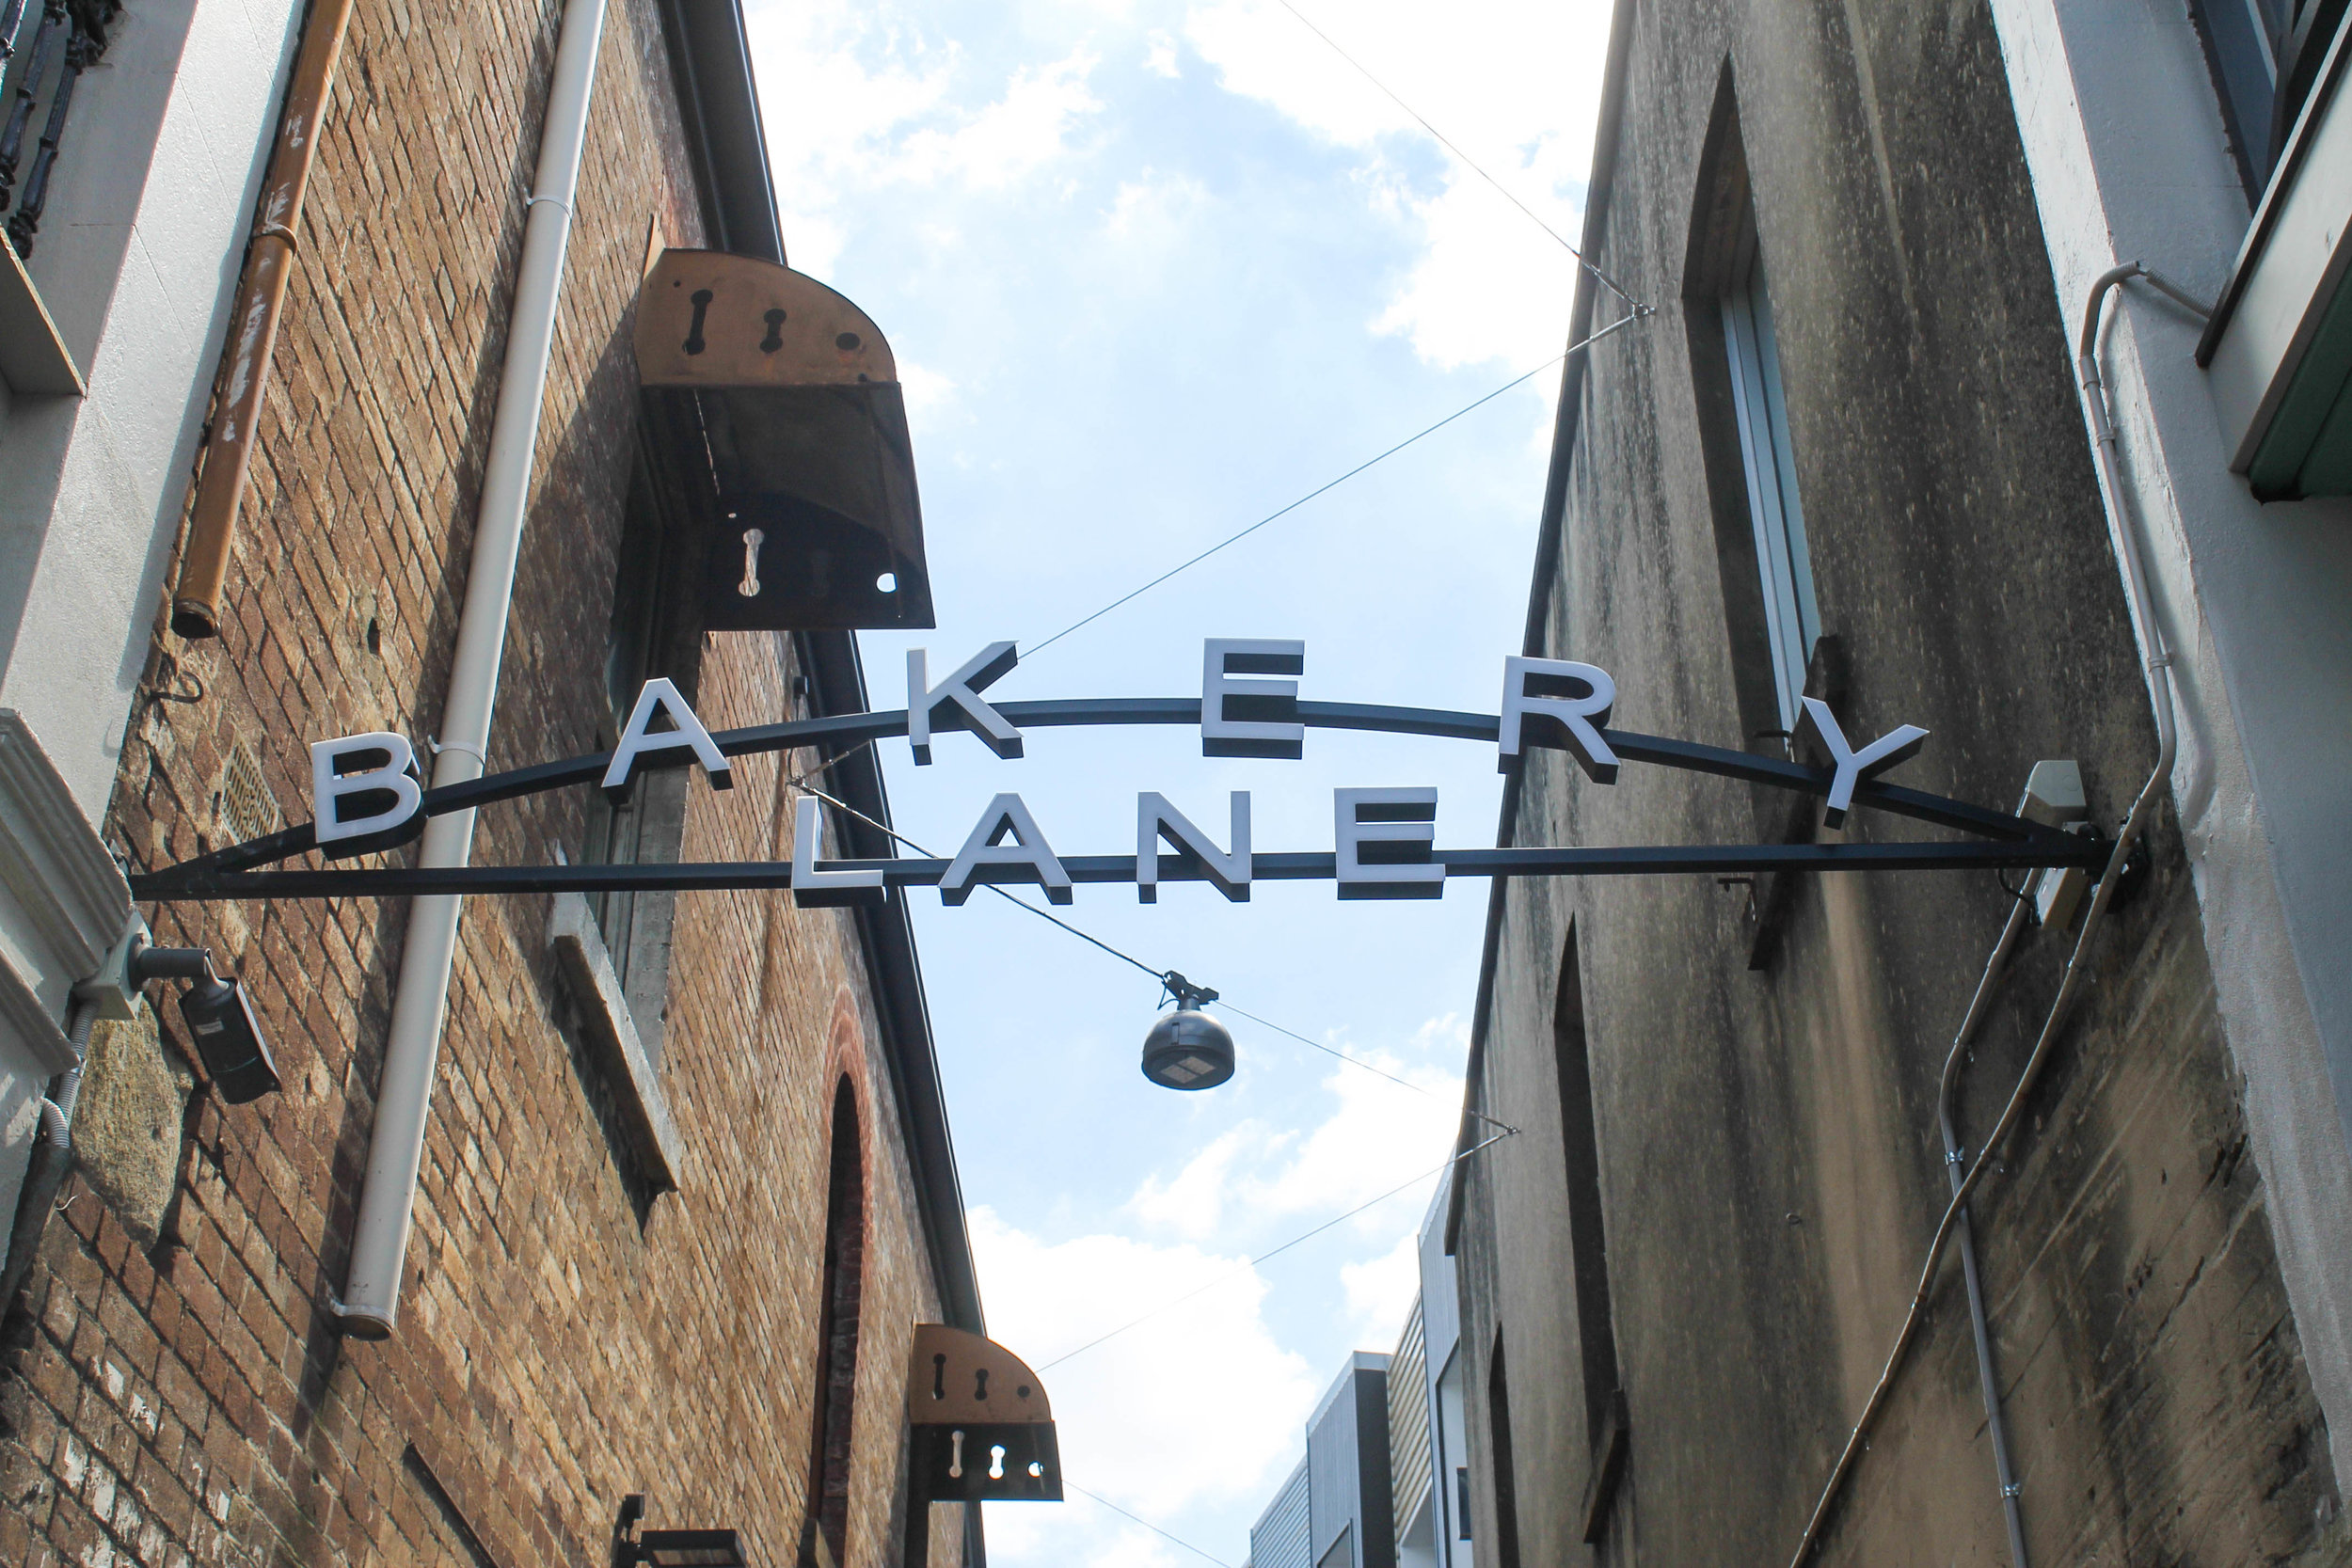 bakery-lane-brisbane